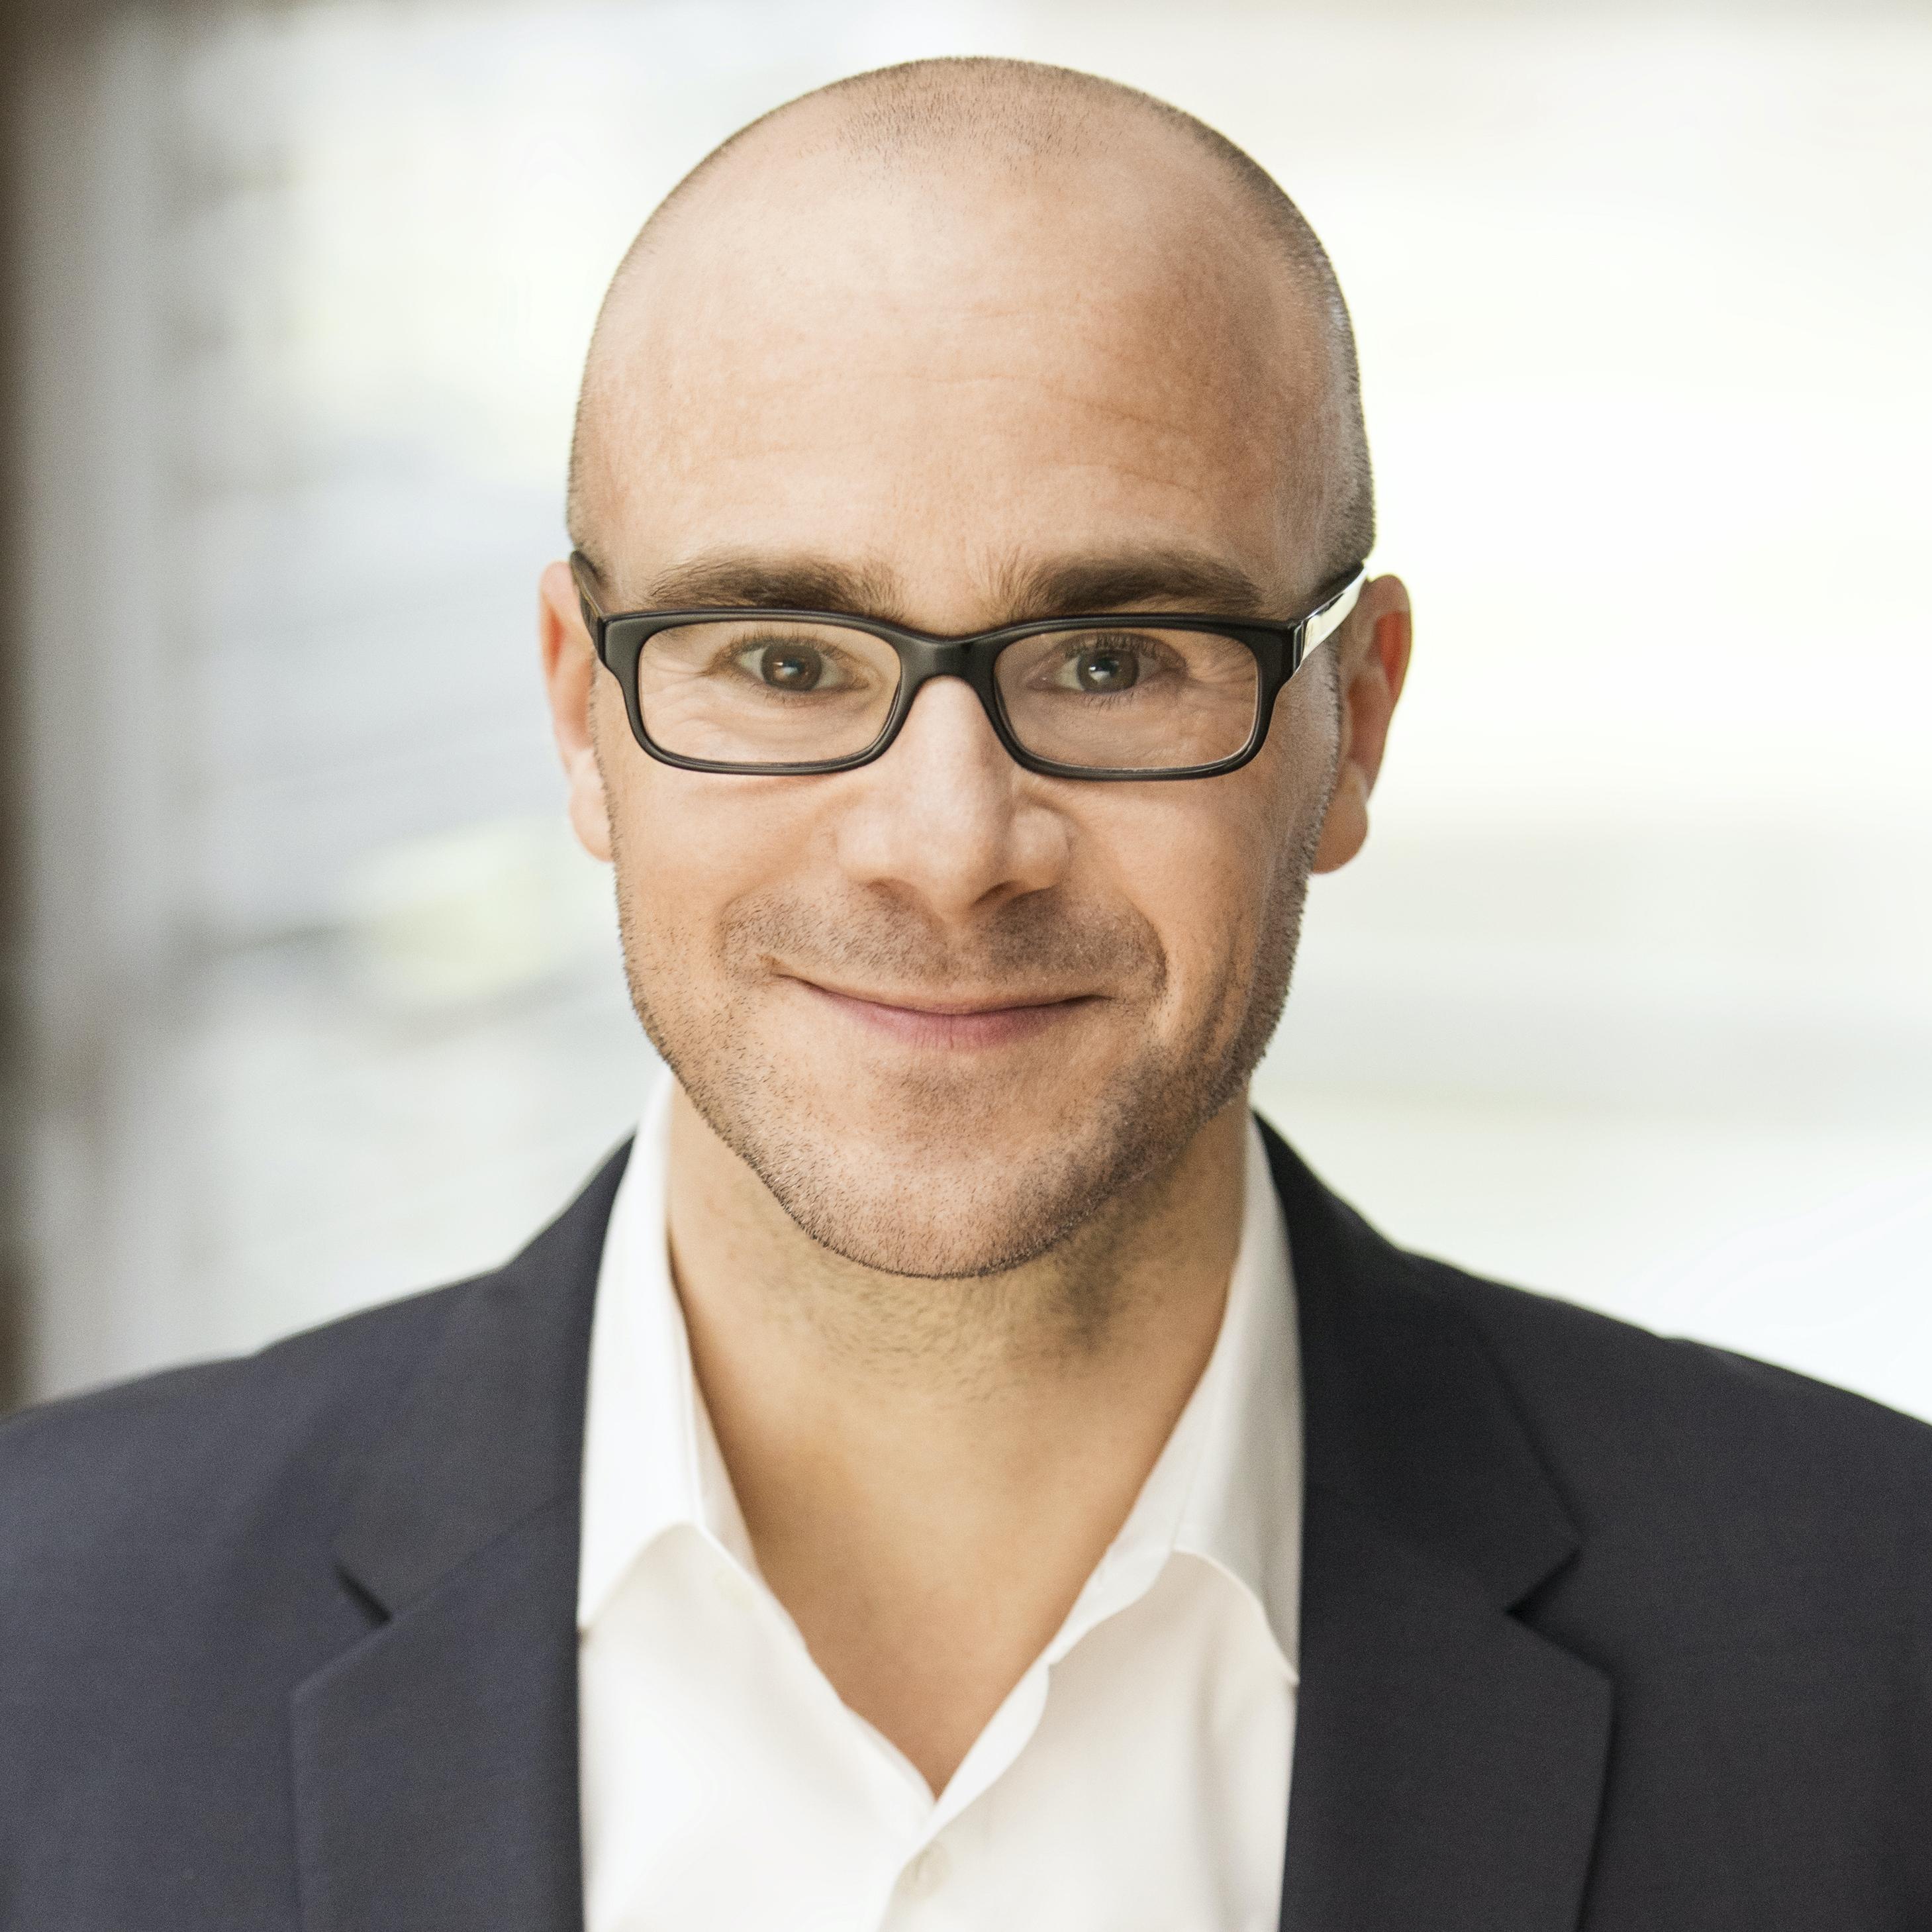 Christian Schmalzl